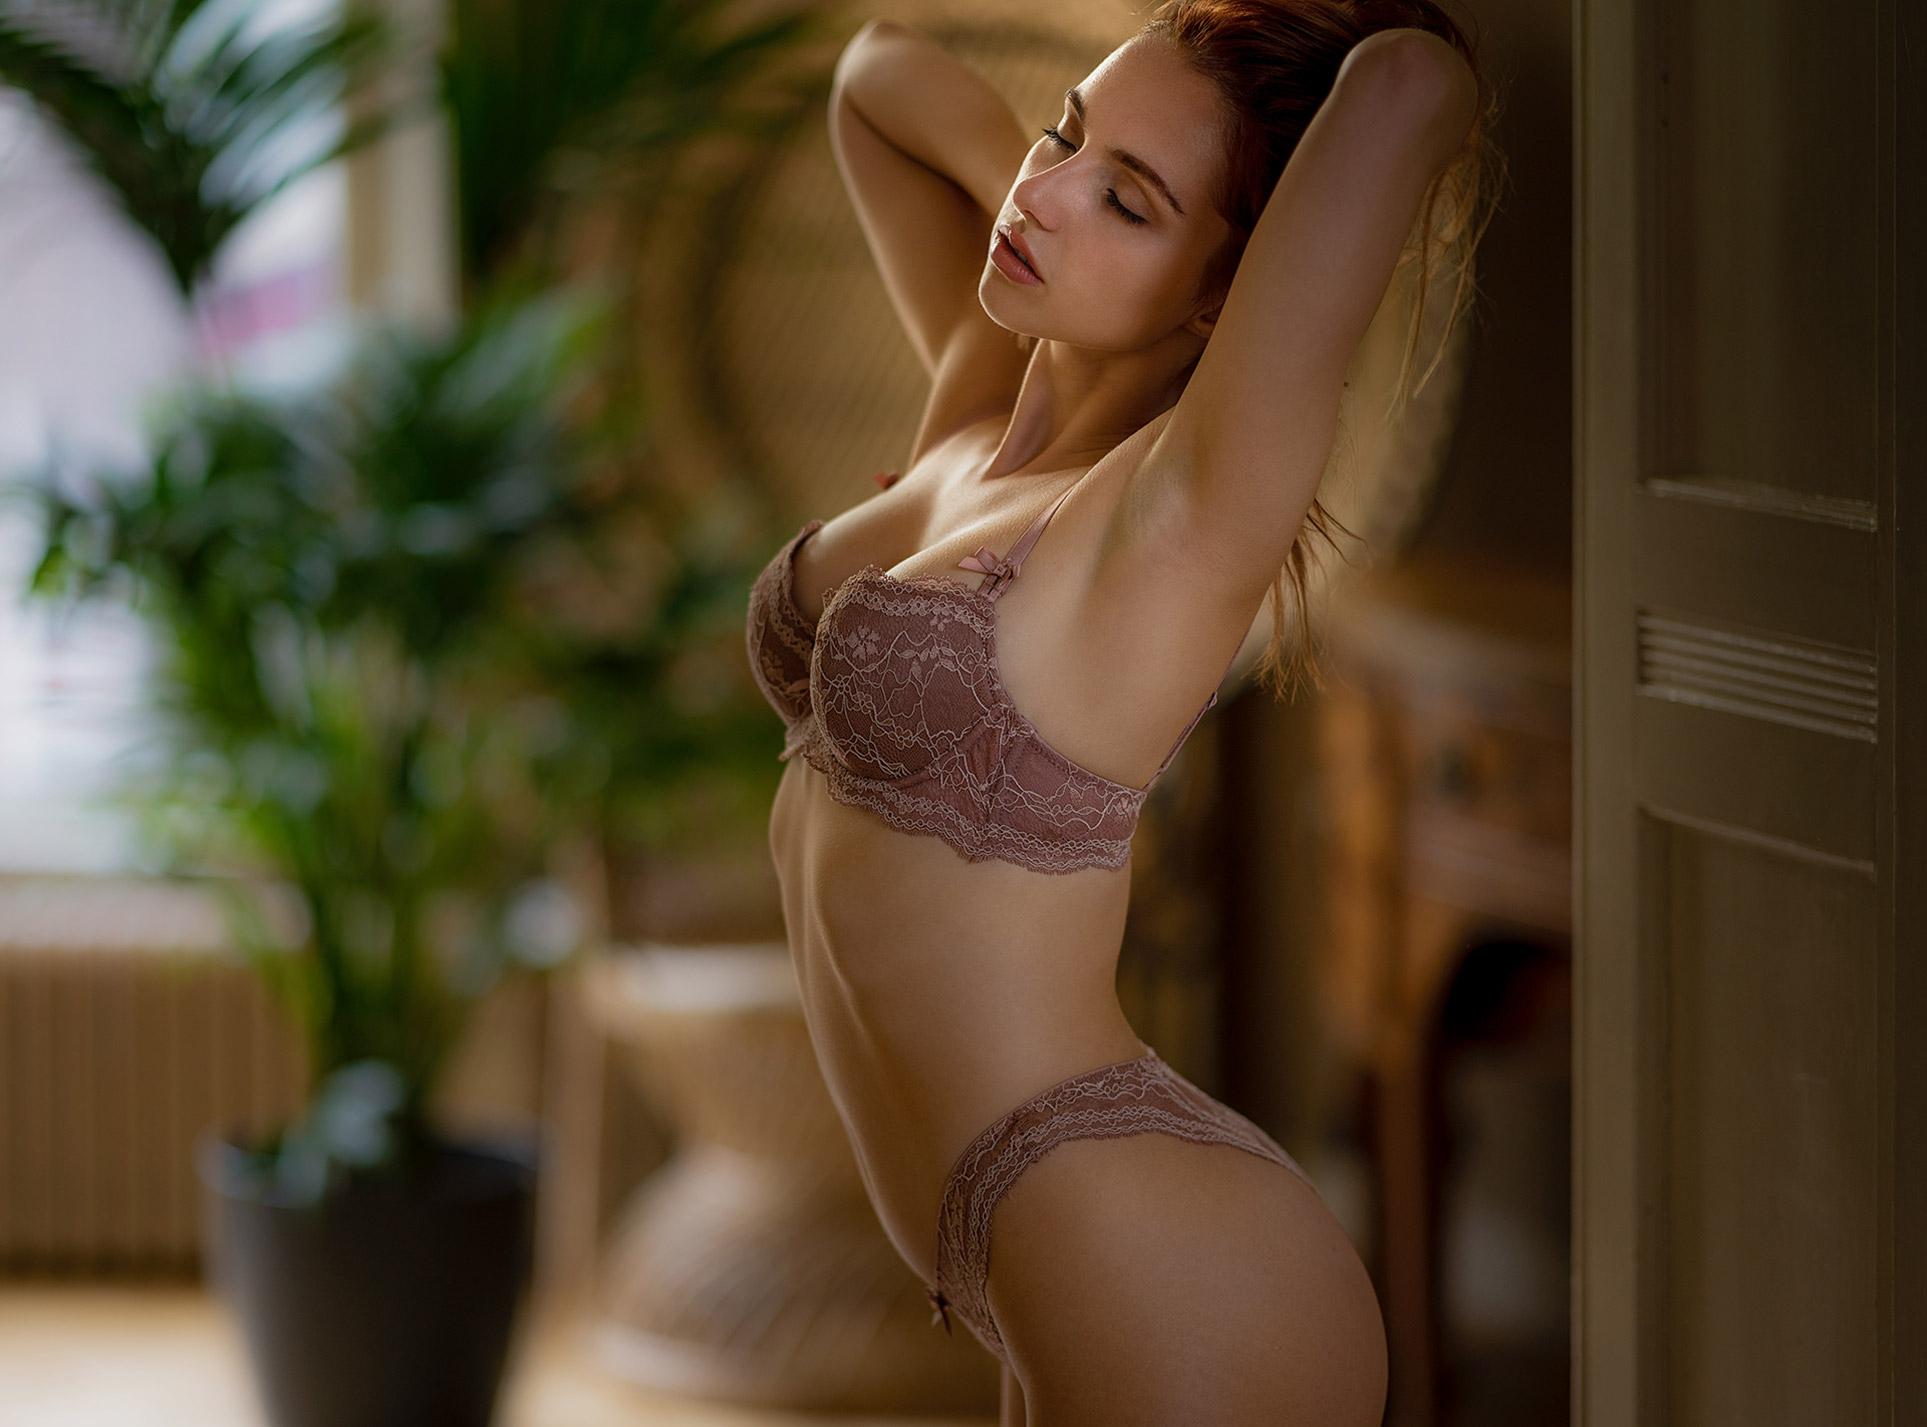 Sophia Blake by Chris Bos